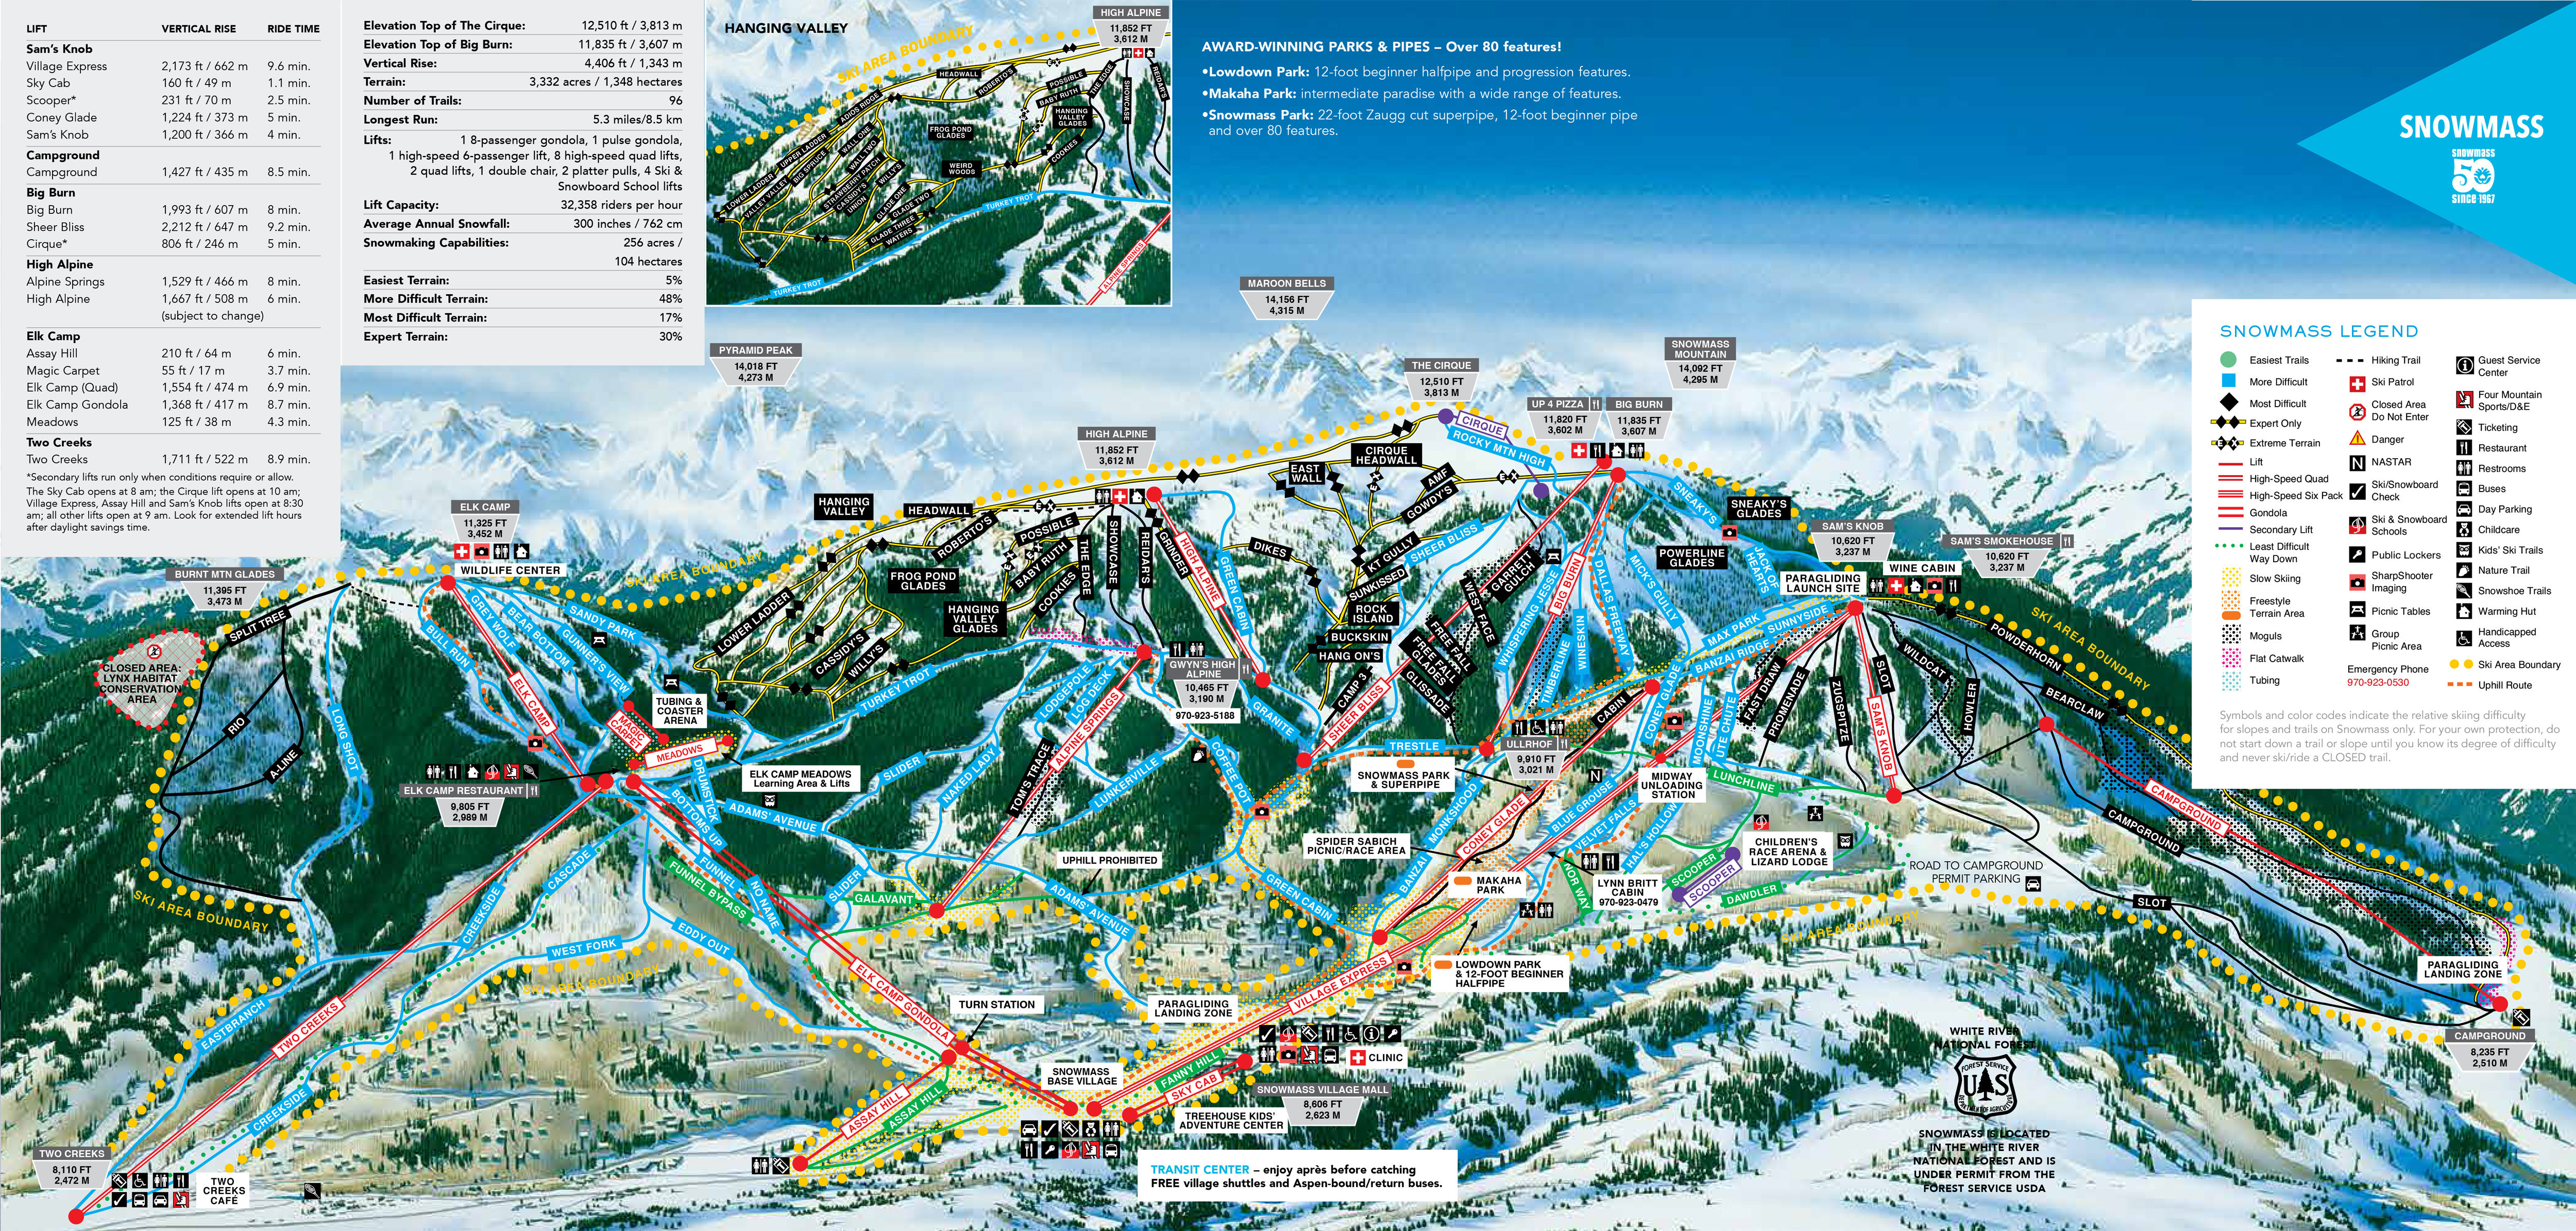 Aspen Snowmass Trail Map • Piste Map • Panoramic Mountain Map